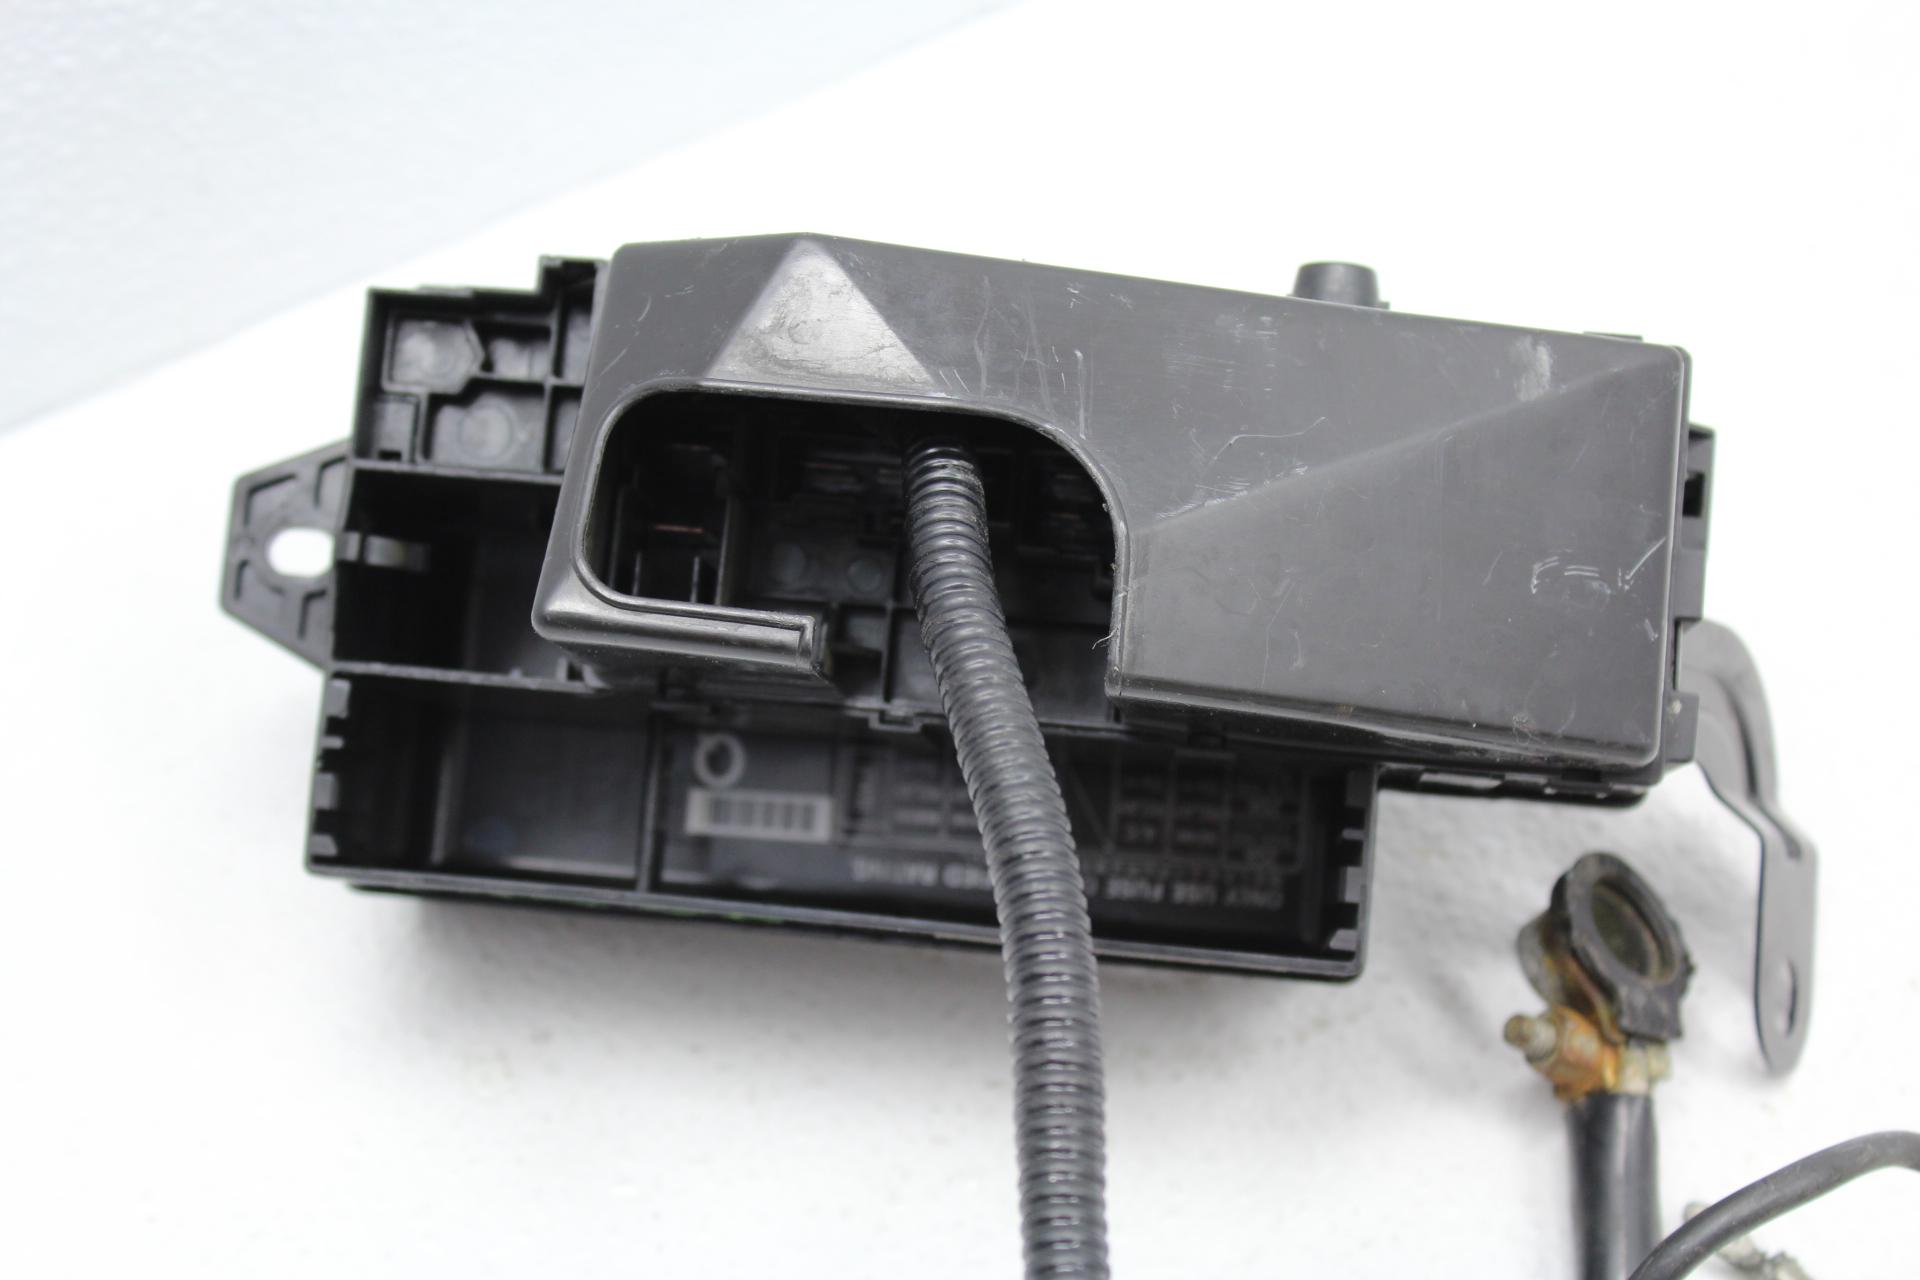 2002-2005 subaru impreza wrx & sti engine bay fuse box ... 2006 subaru impreza fuse box